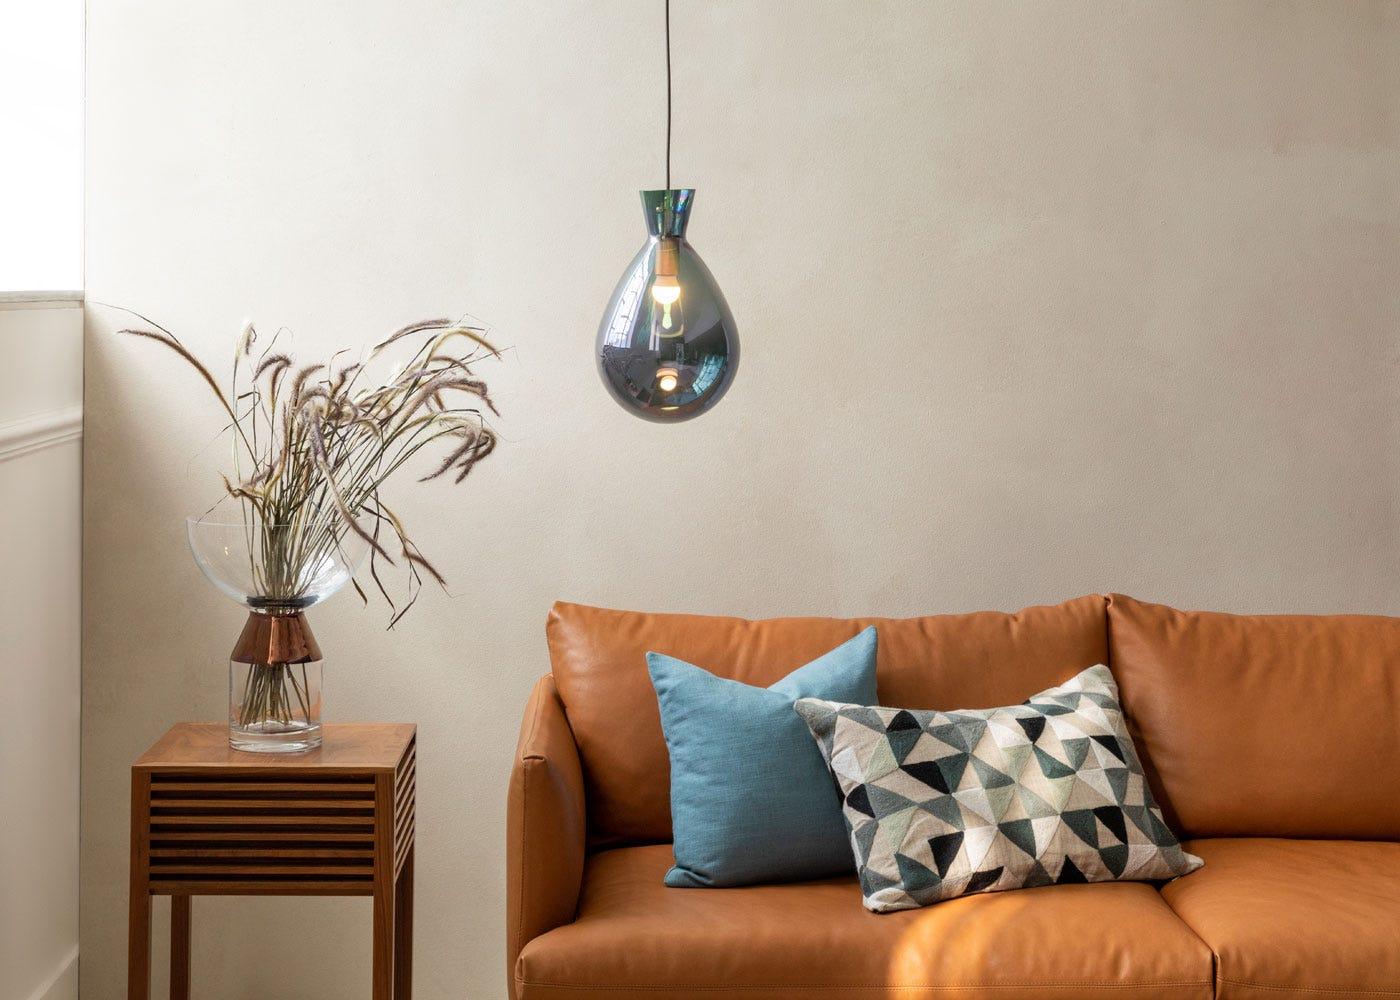 Balloon glass pendant in iridescent smoke, Matera leather sofa, Verona side table in walnut.